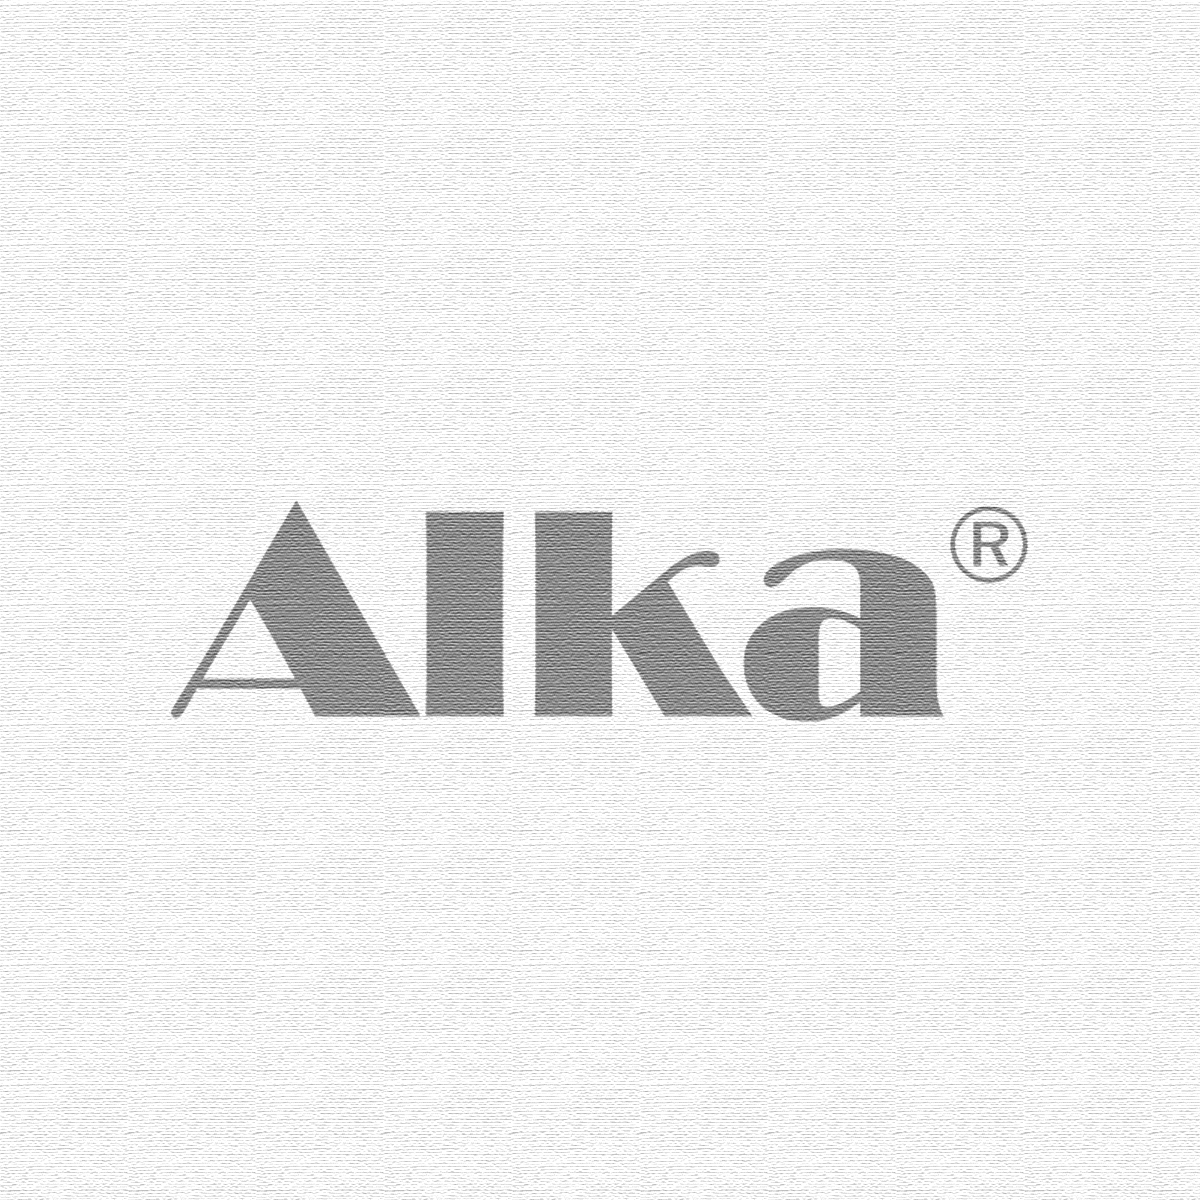 Alka® Drops - 37ml - English label